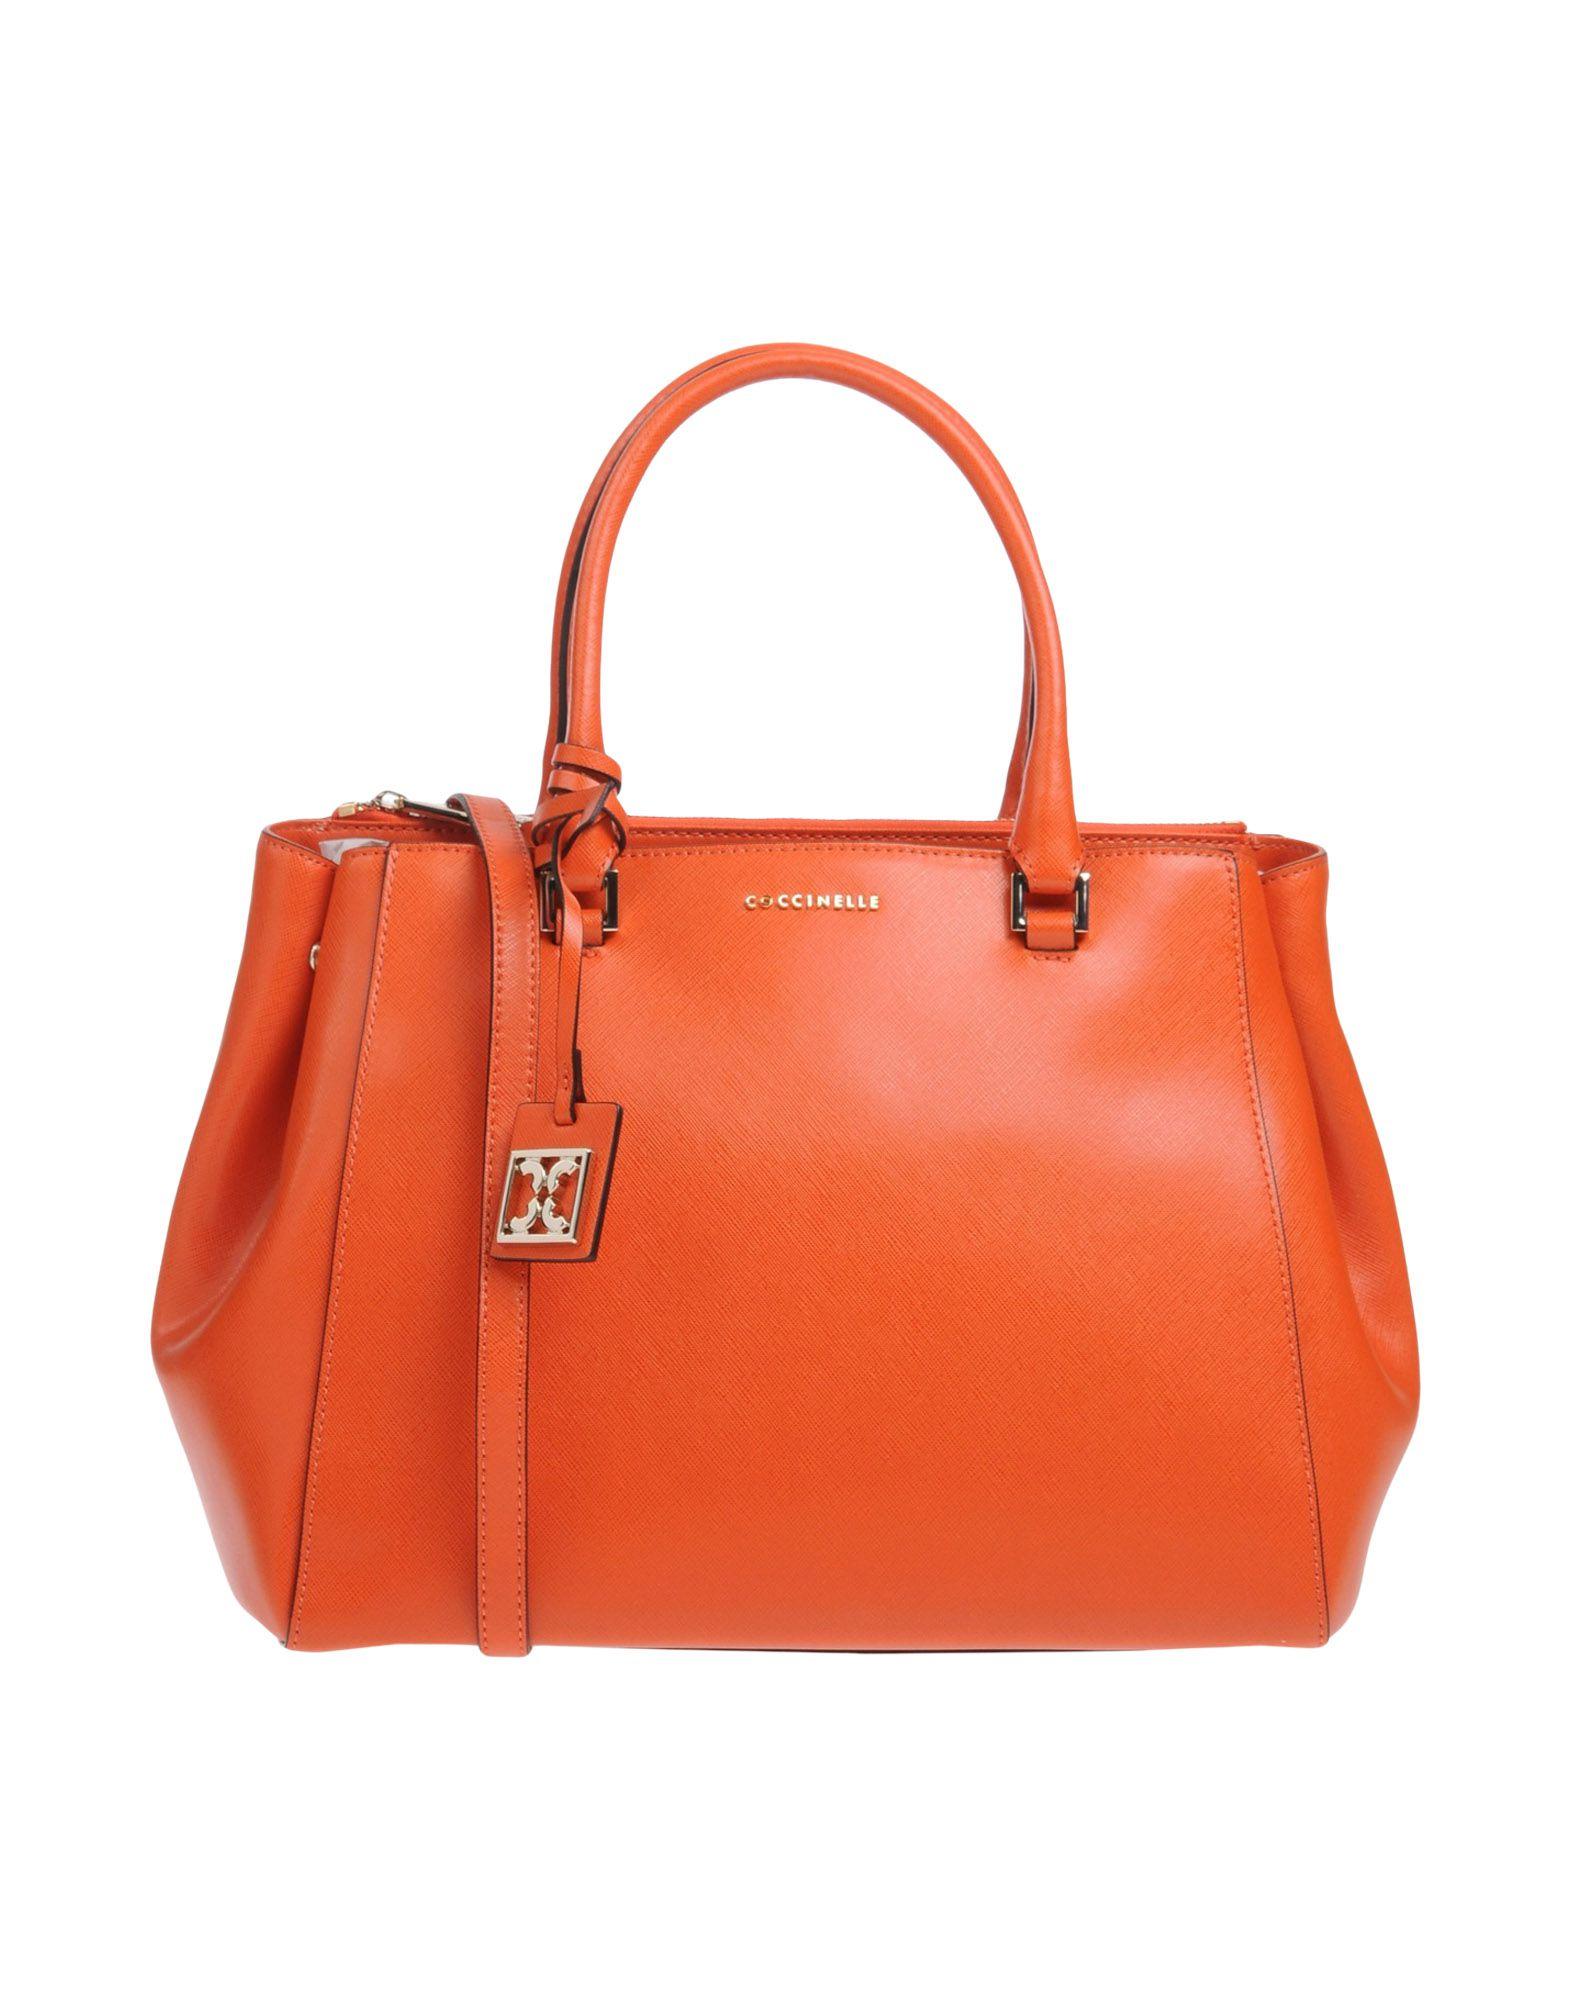 COCCINELLE Сумка на руку сумка coccinelle c1 yb5 11 01 01 001